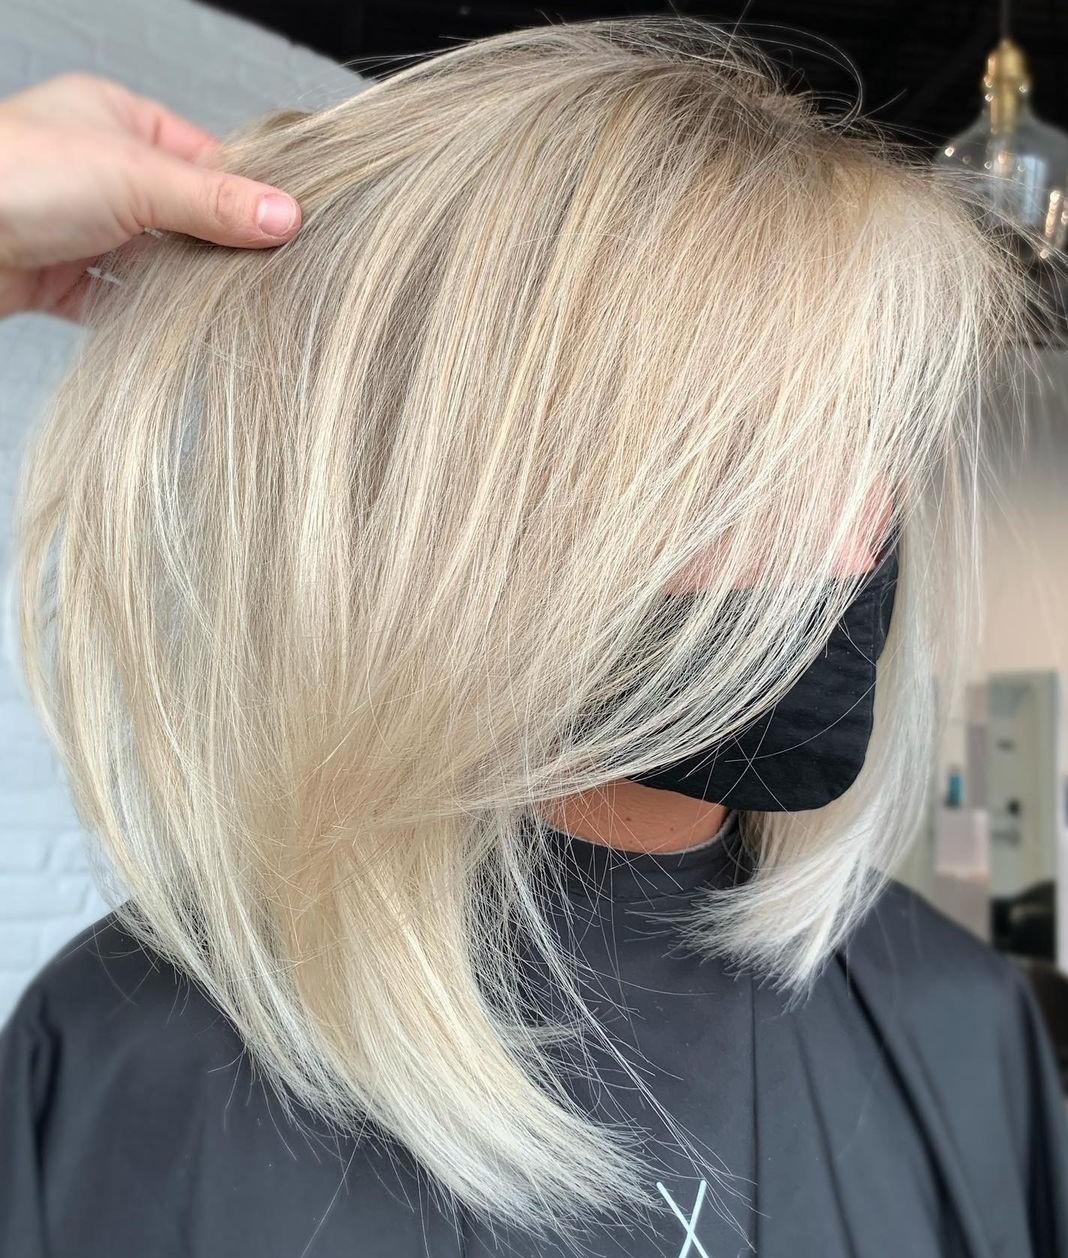 Wispy Medium Hairstyle for Thin Hair